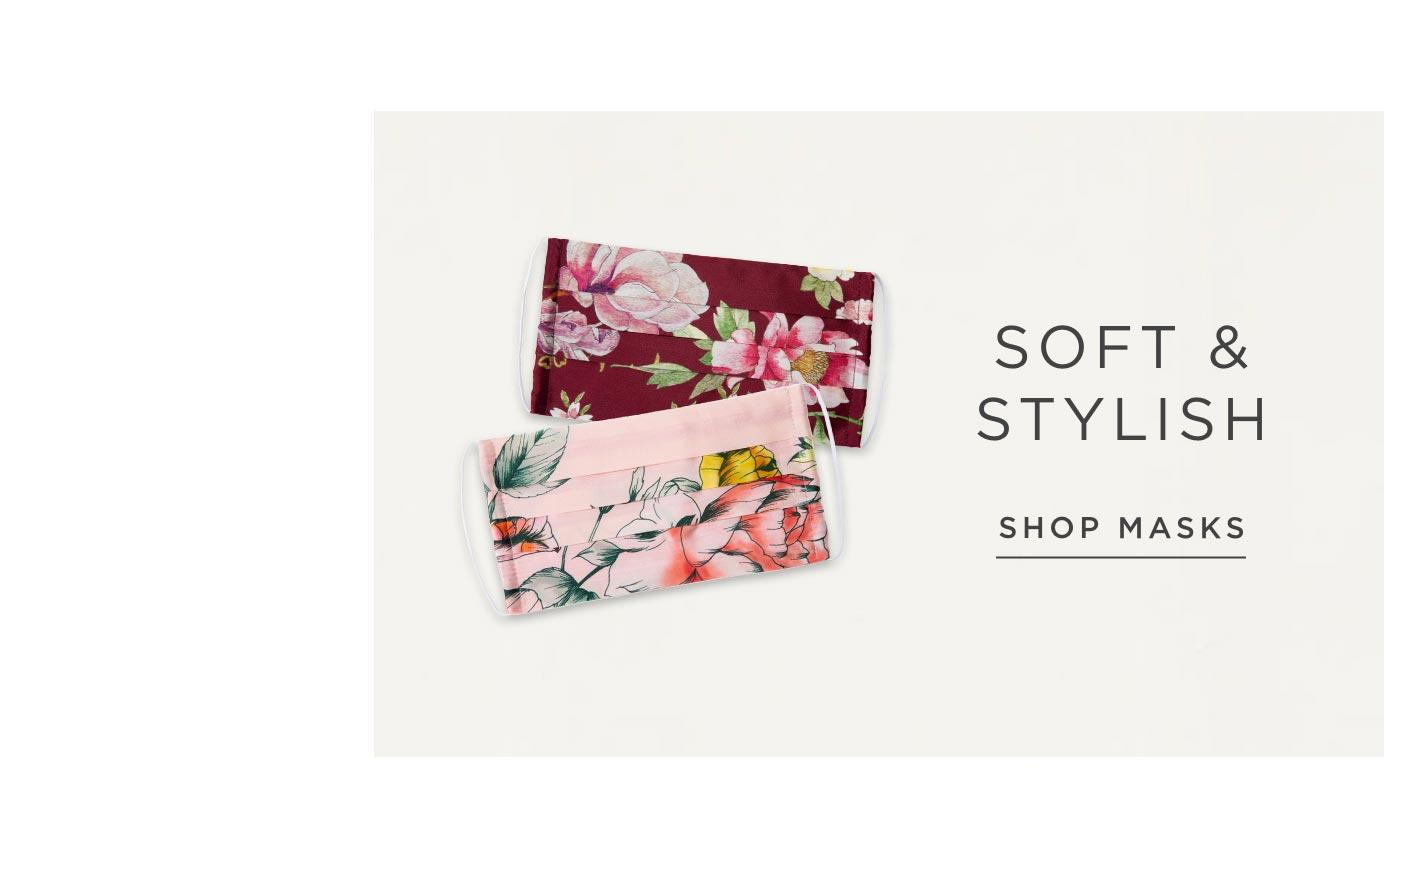 Soft & Stylish - Shop Masks